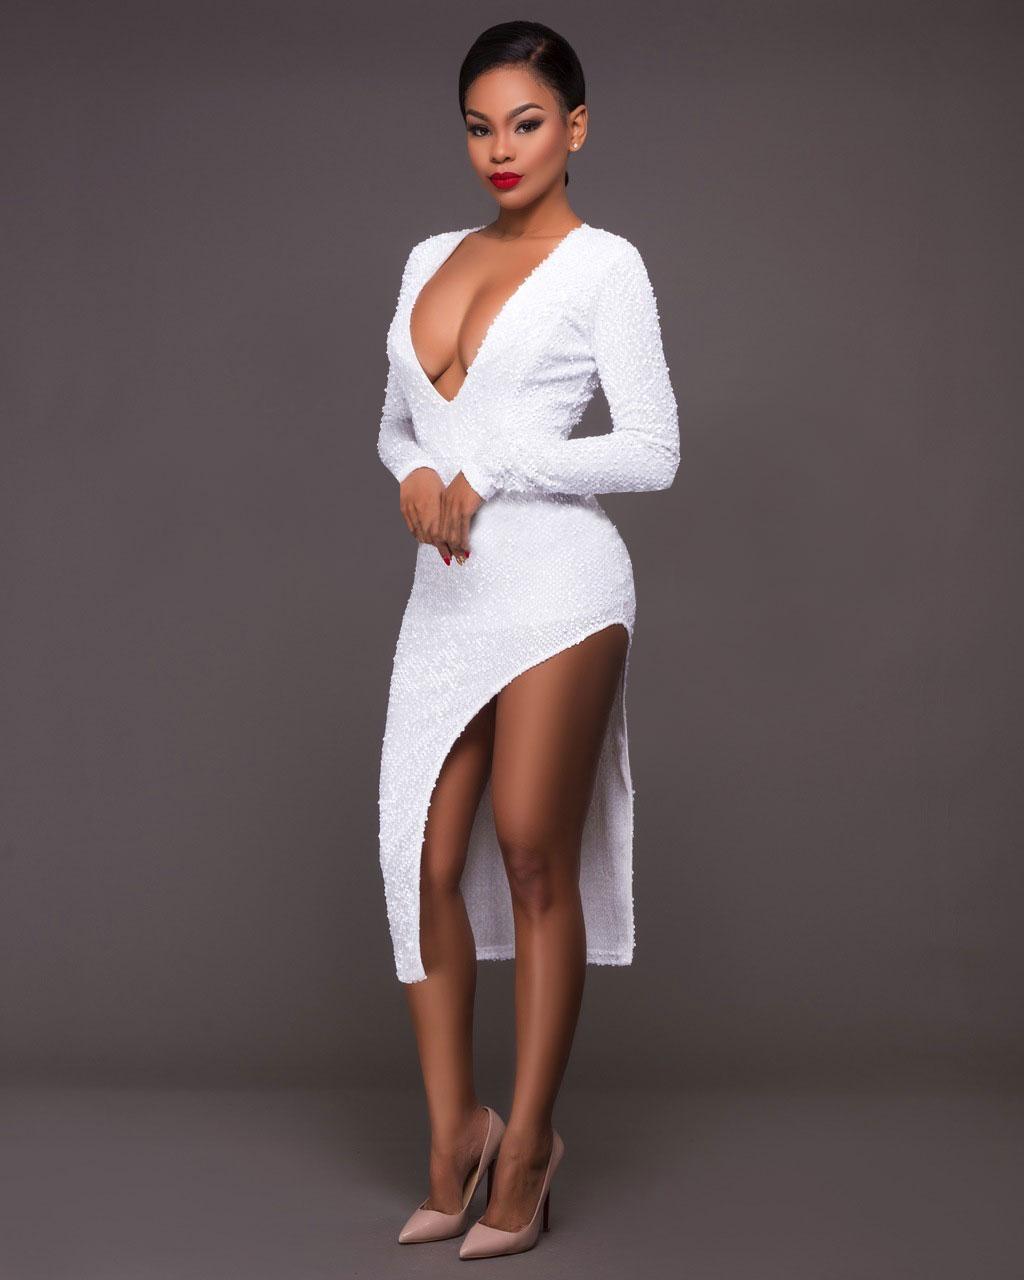 3c92c205110 Sexy Women Dress High Quality Flash Sequin Bodycon Deep V Neck Side Cut  Hollow Out Pencil Elastic Party Dresses Black Color White Color S M L XL